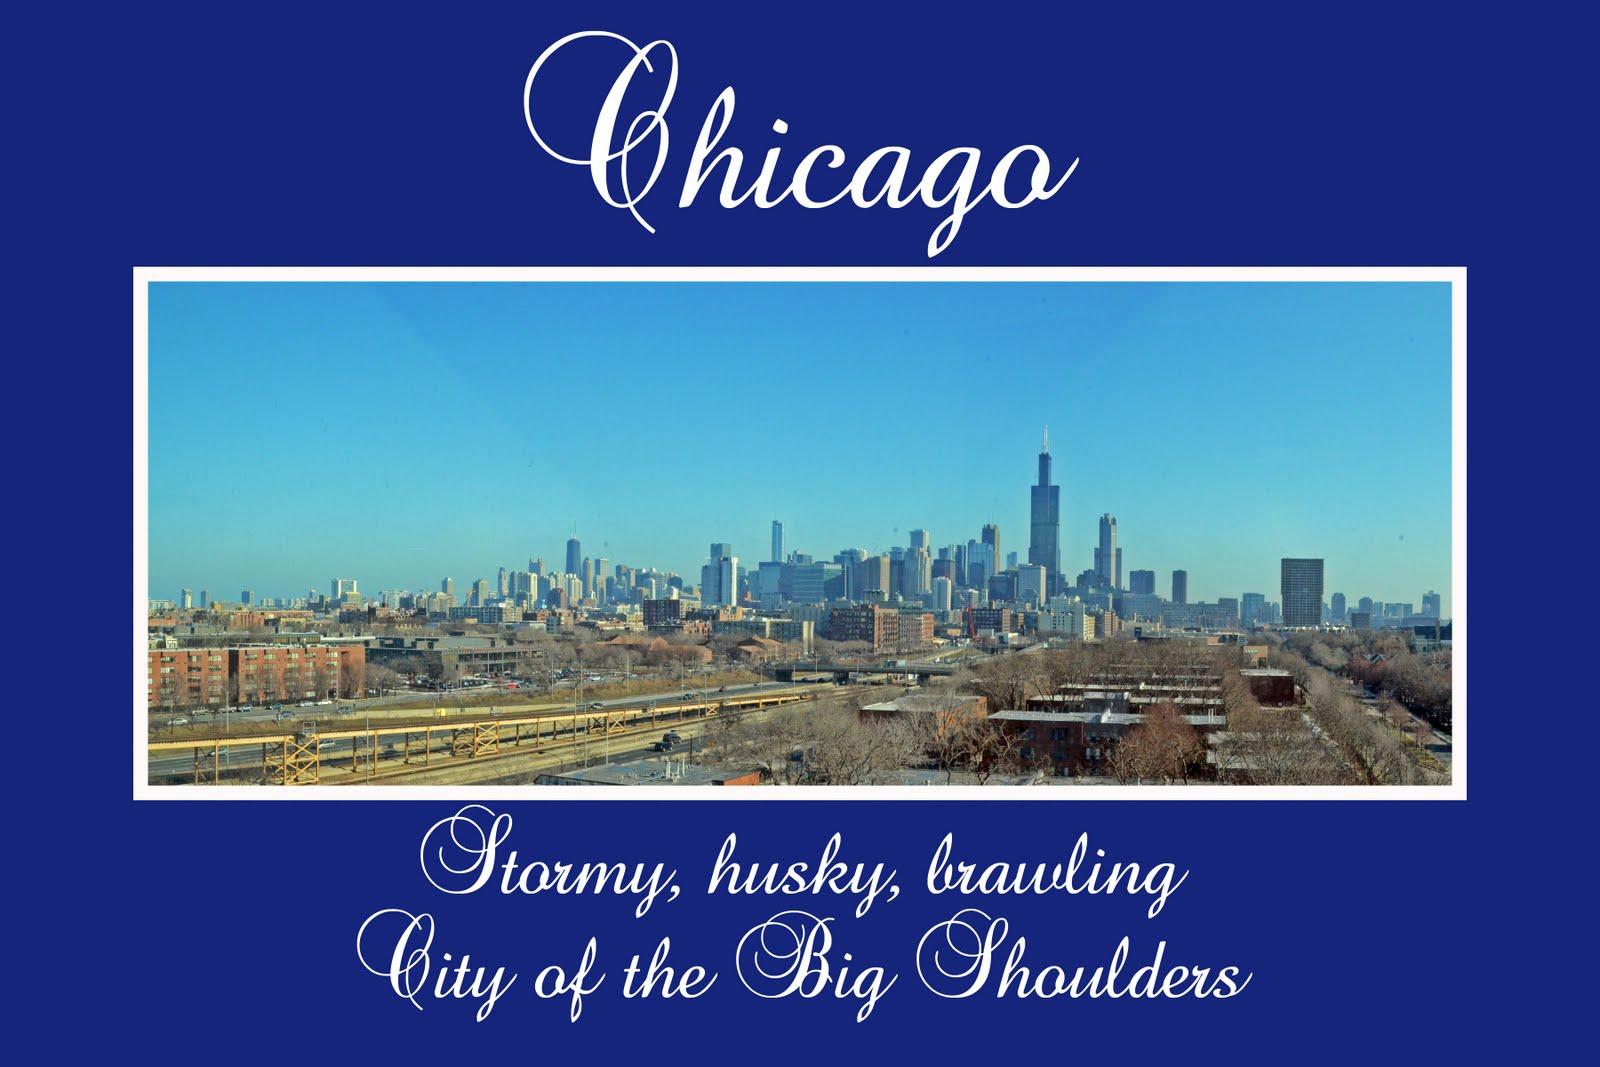 http://4.bp.blogspot.com/-qfVce6Z0KFQ/Tx-hbg84WMI/AAAAAAAAEs8/UpqGrPuzTIY/s1600/Chicago%2BSkyline%2B2012%2B001.jpg